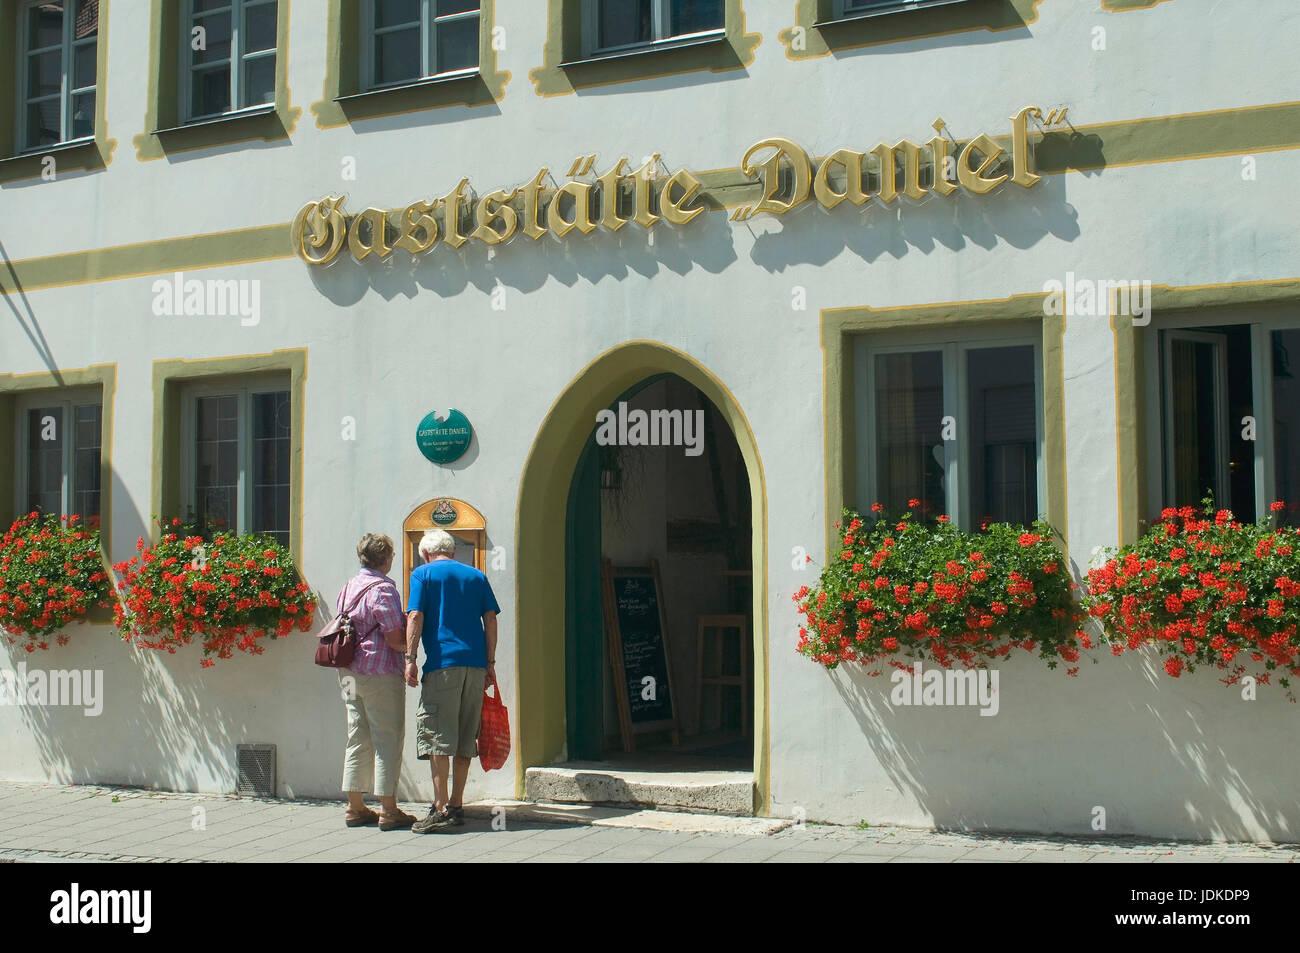 Europe, Germany, Bavaria, Ingolstadt, Old Town, historical restaurant Daniel, , Europa, Deutschland, Bayern, Altstadt, - Stock Image